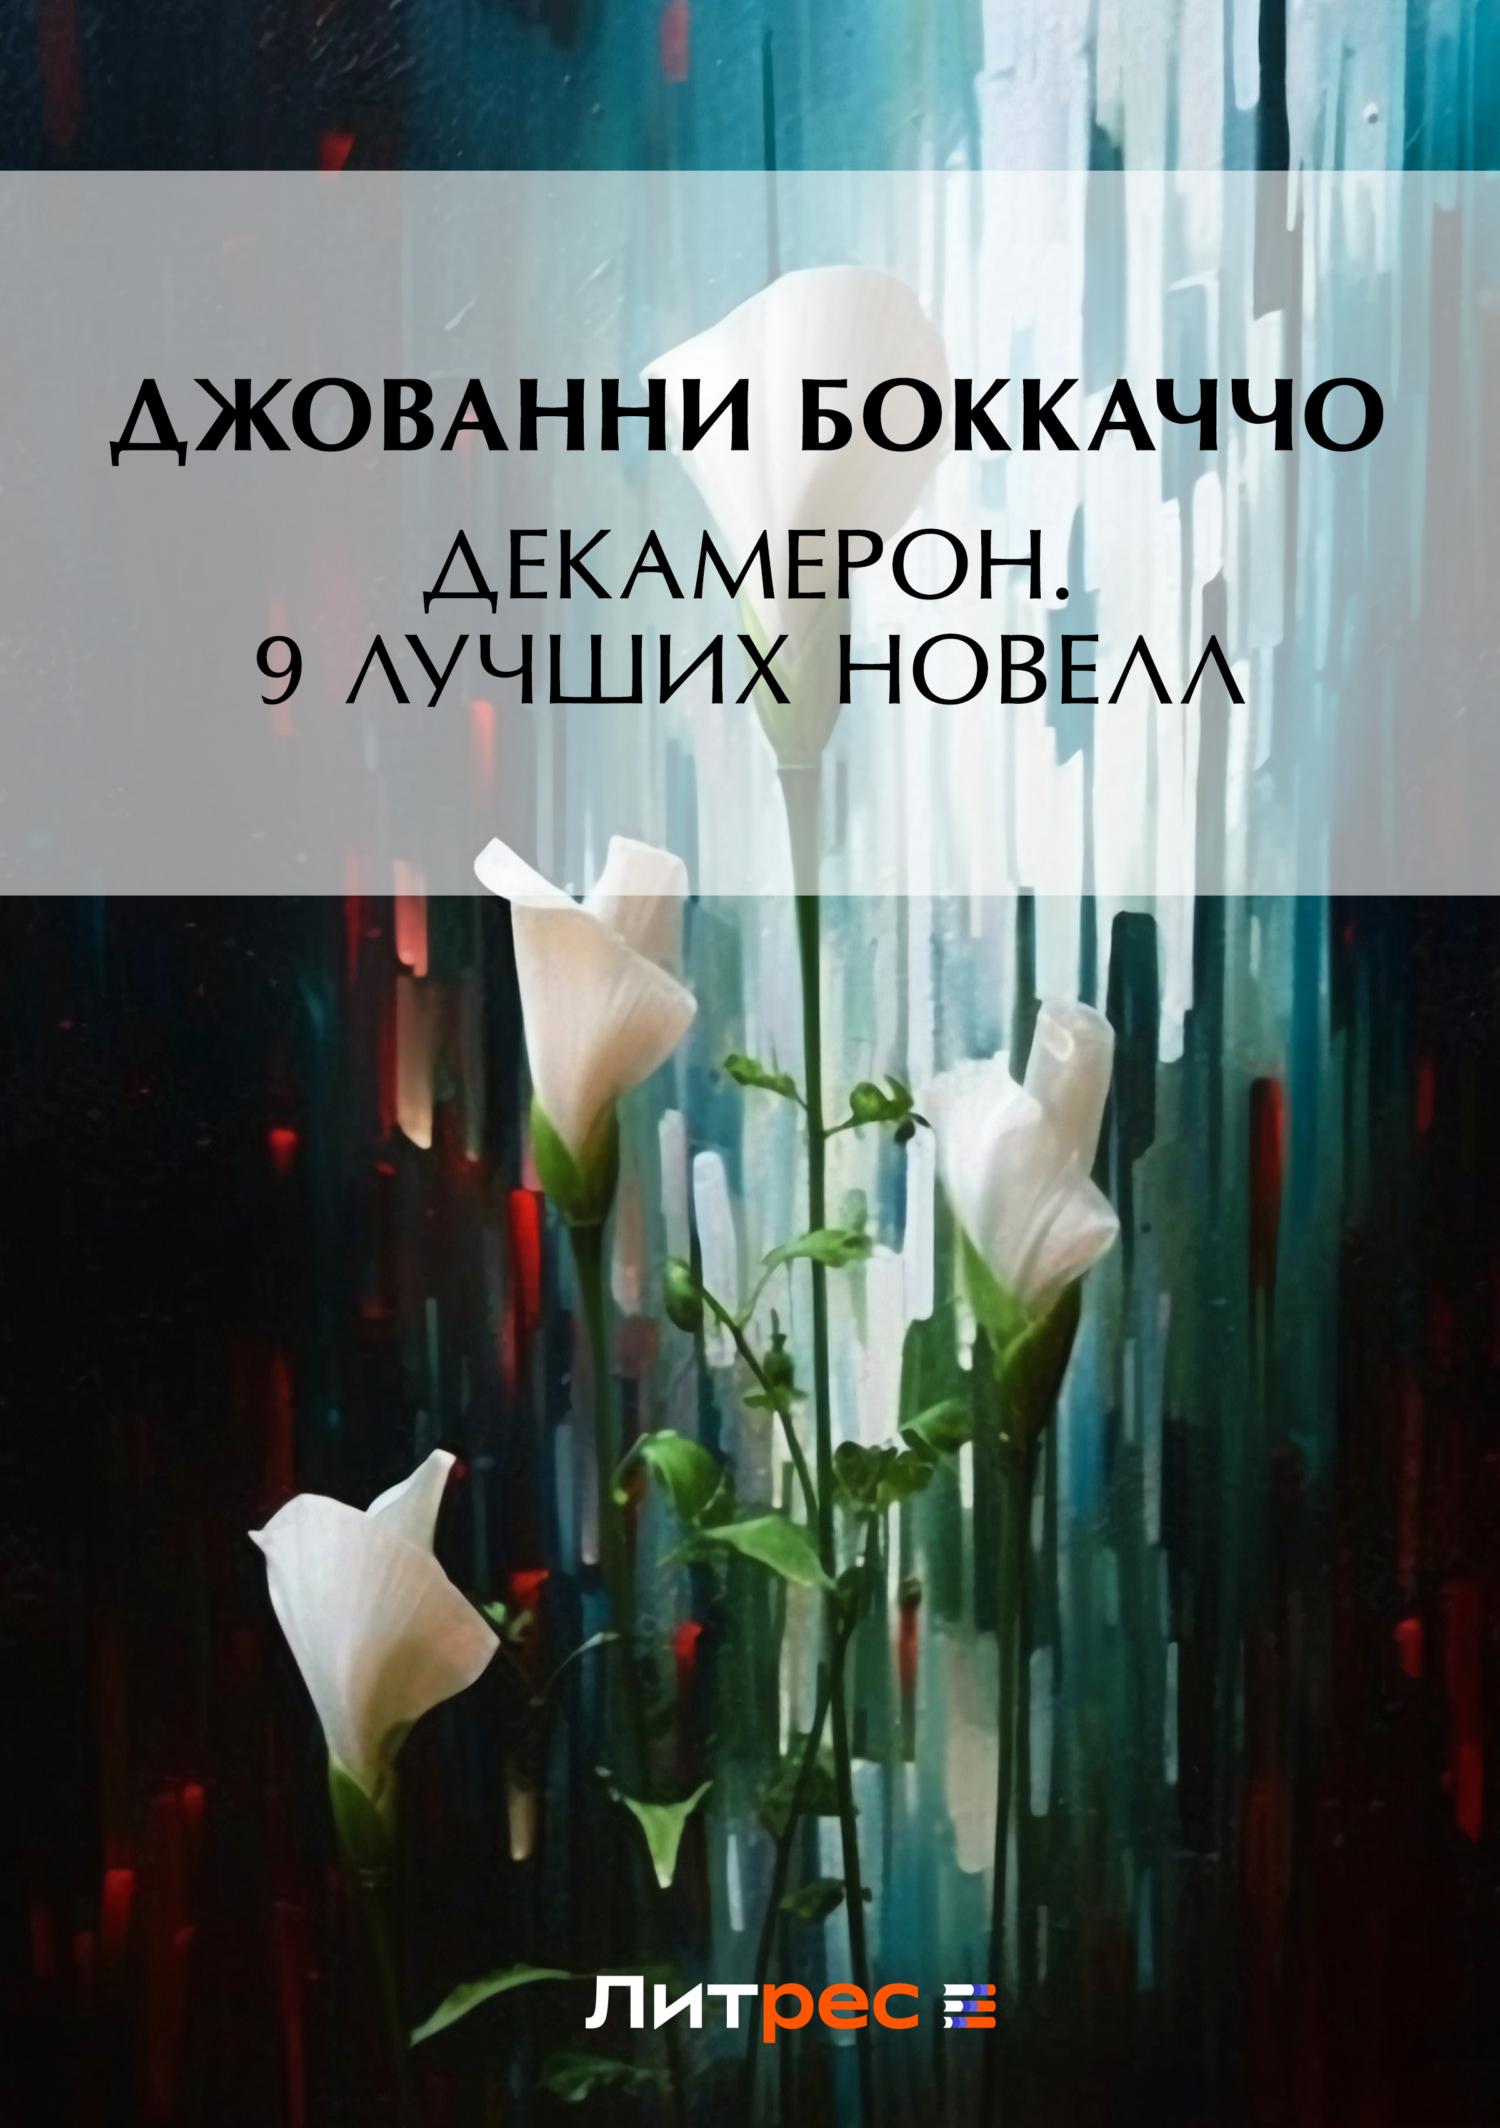 dekameron 9 luchshikh novell